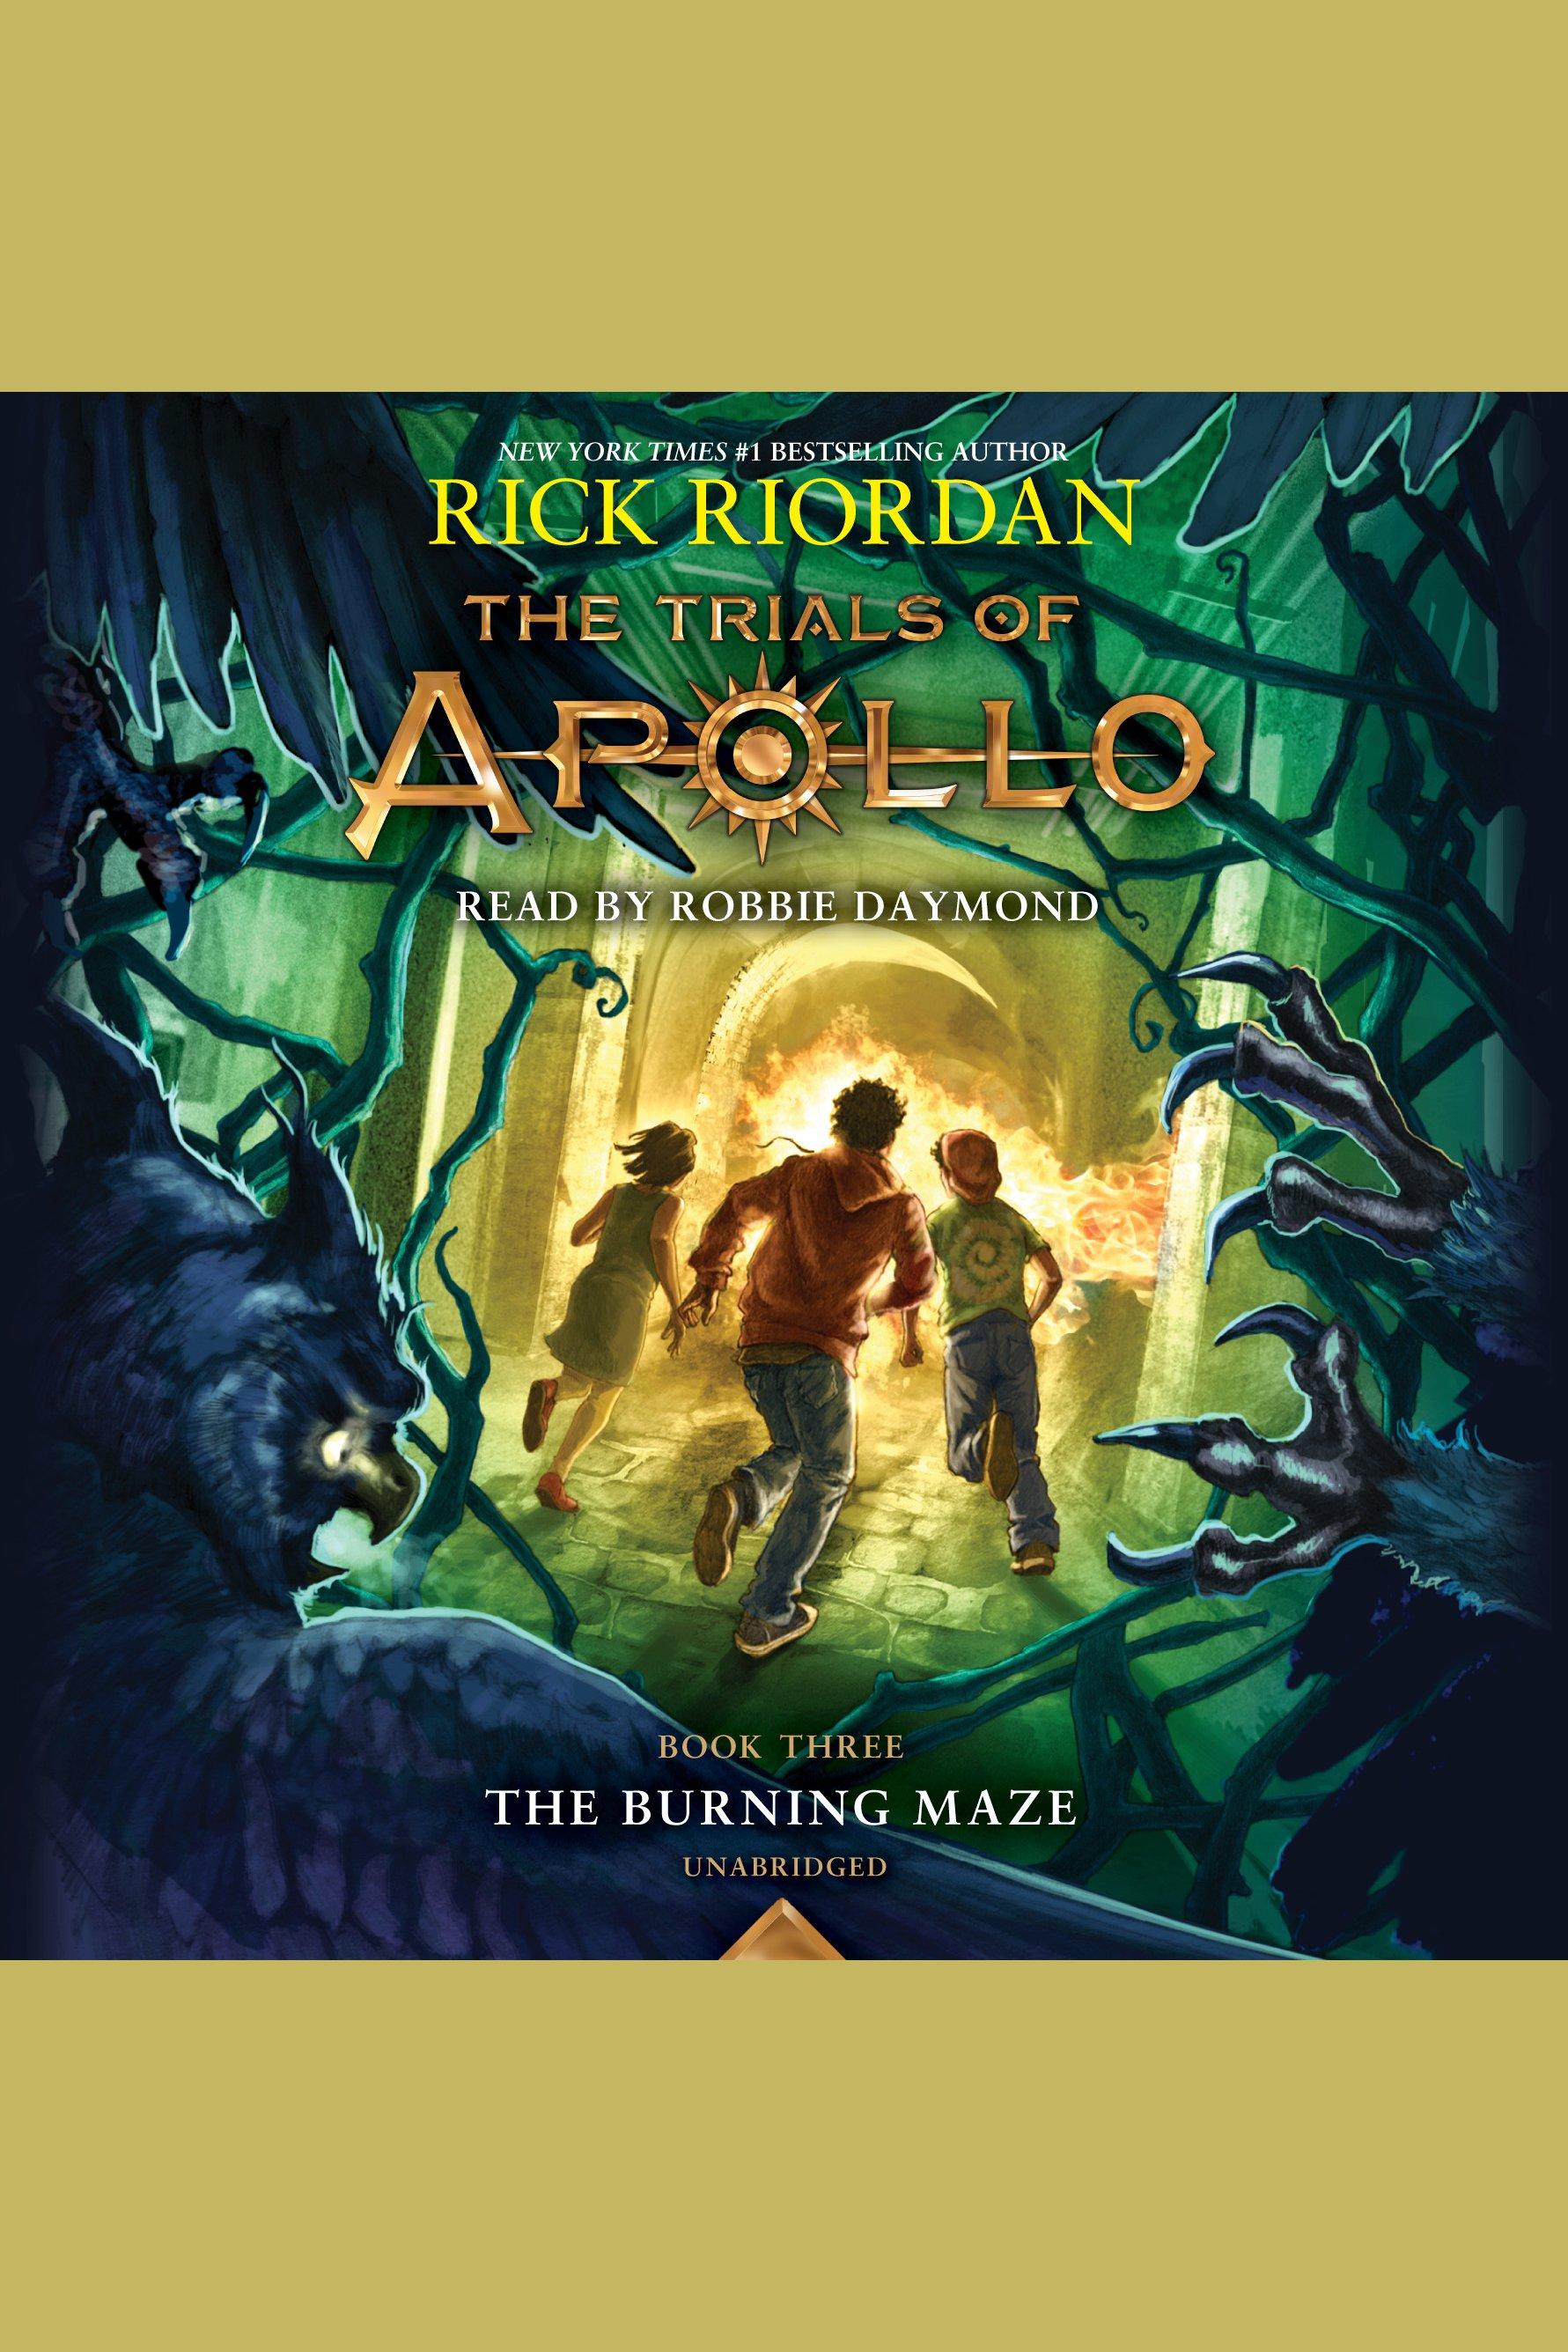 The burning maze cover image